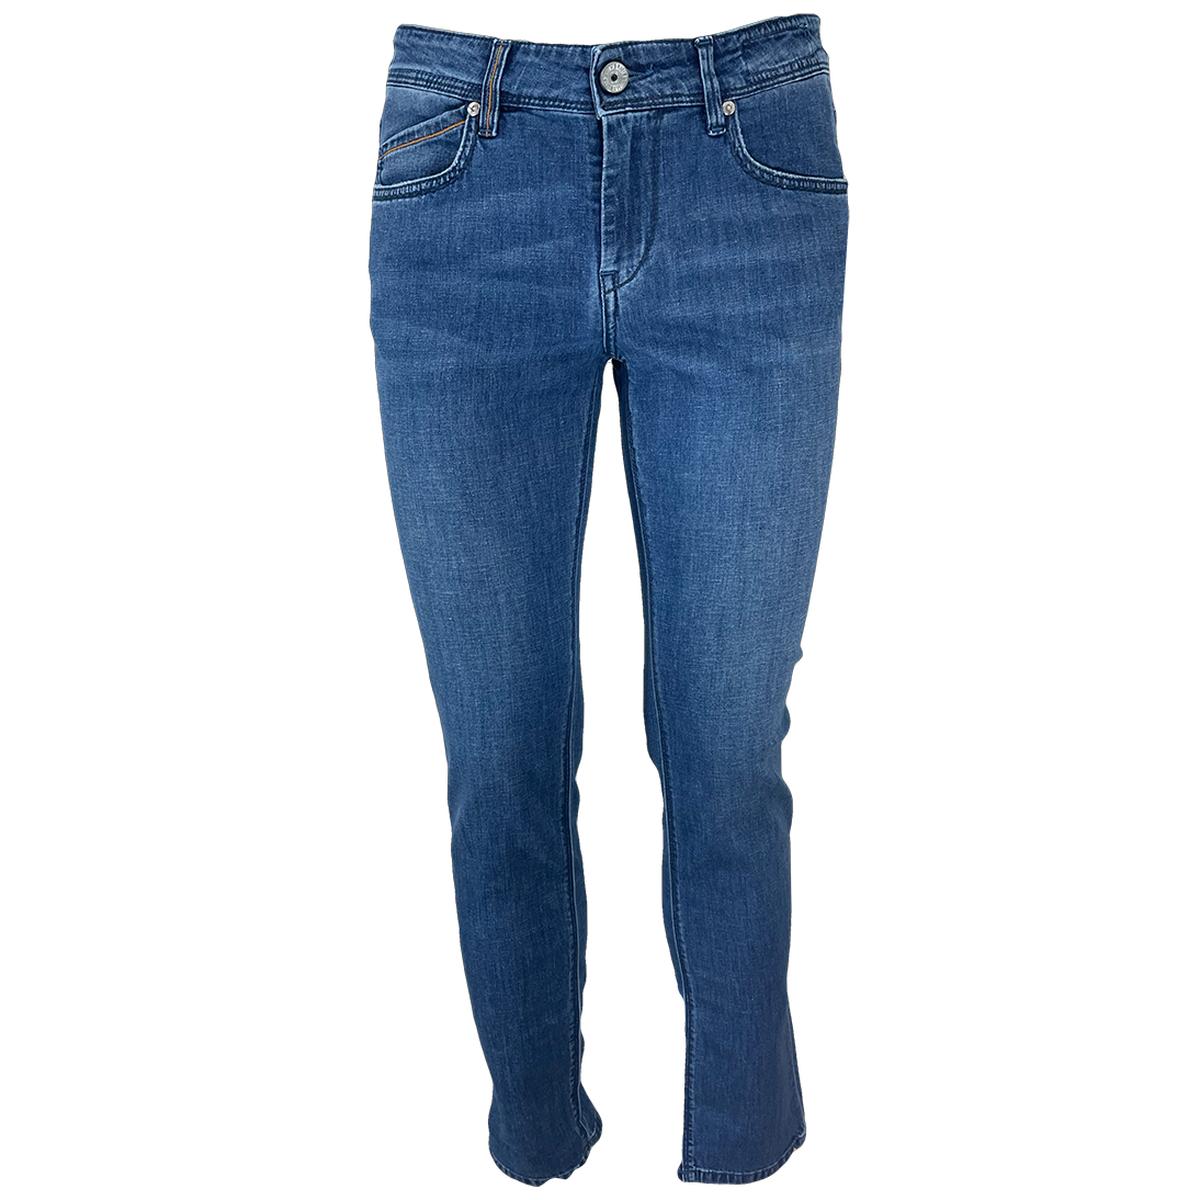 1. Jeans Rubens-Z Re-Hash Blue Re-Hash